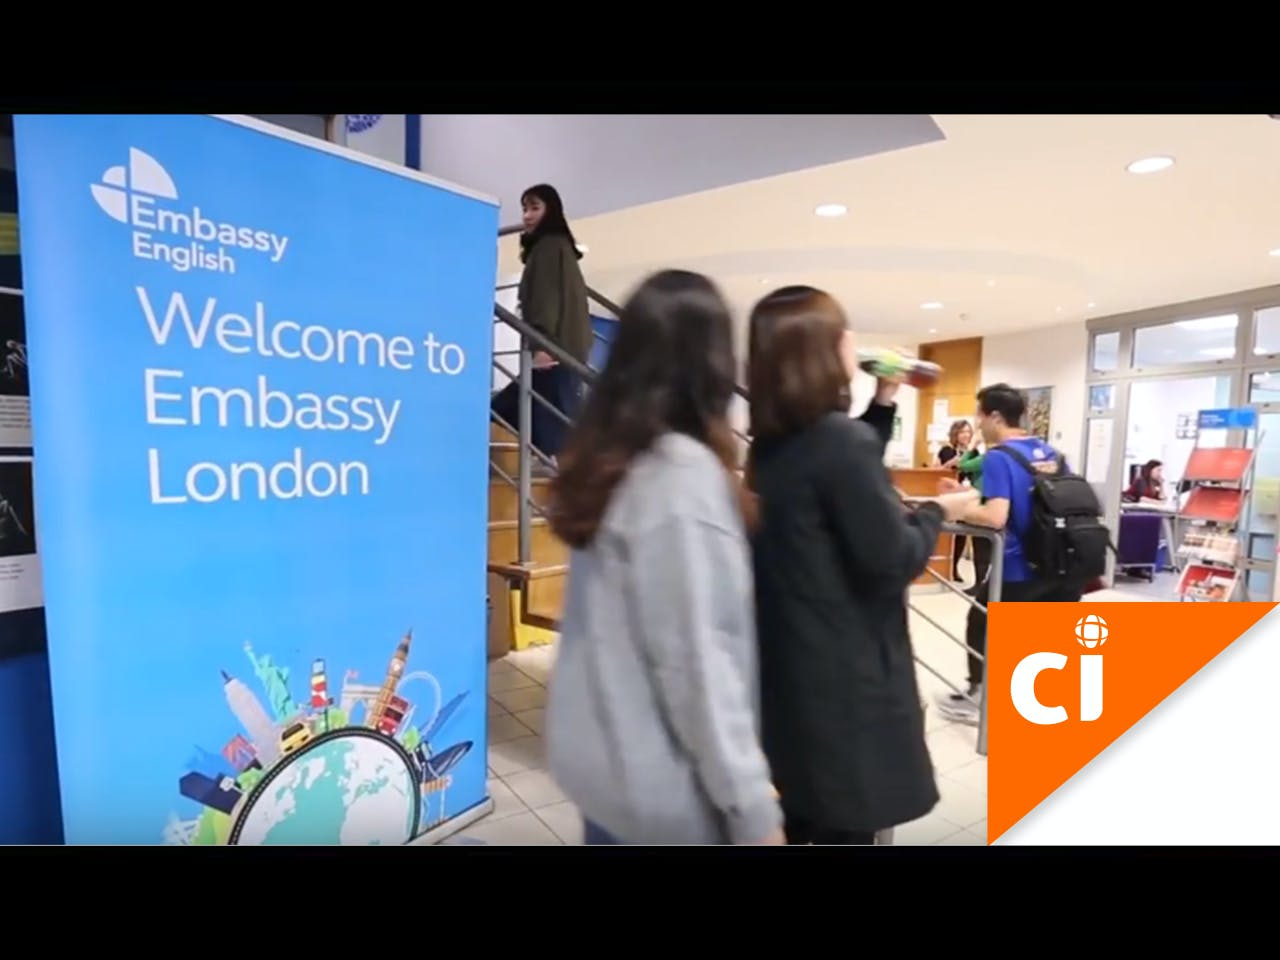 Embassy - Londres